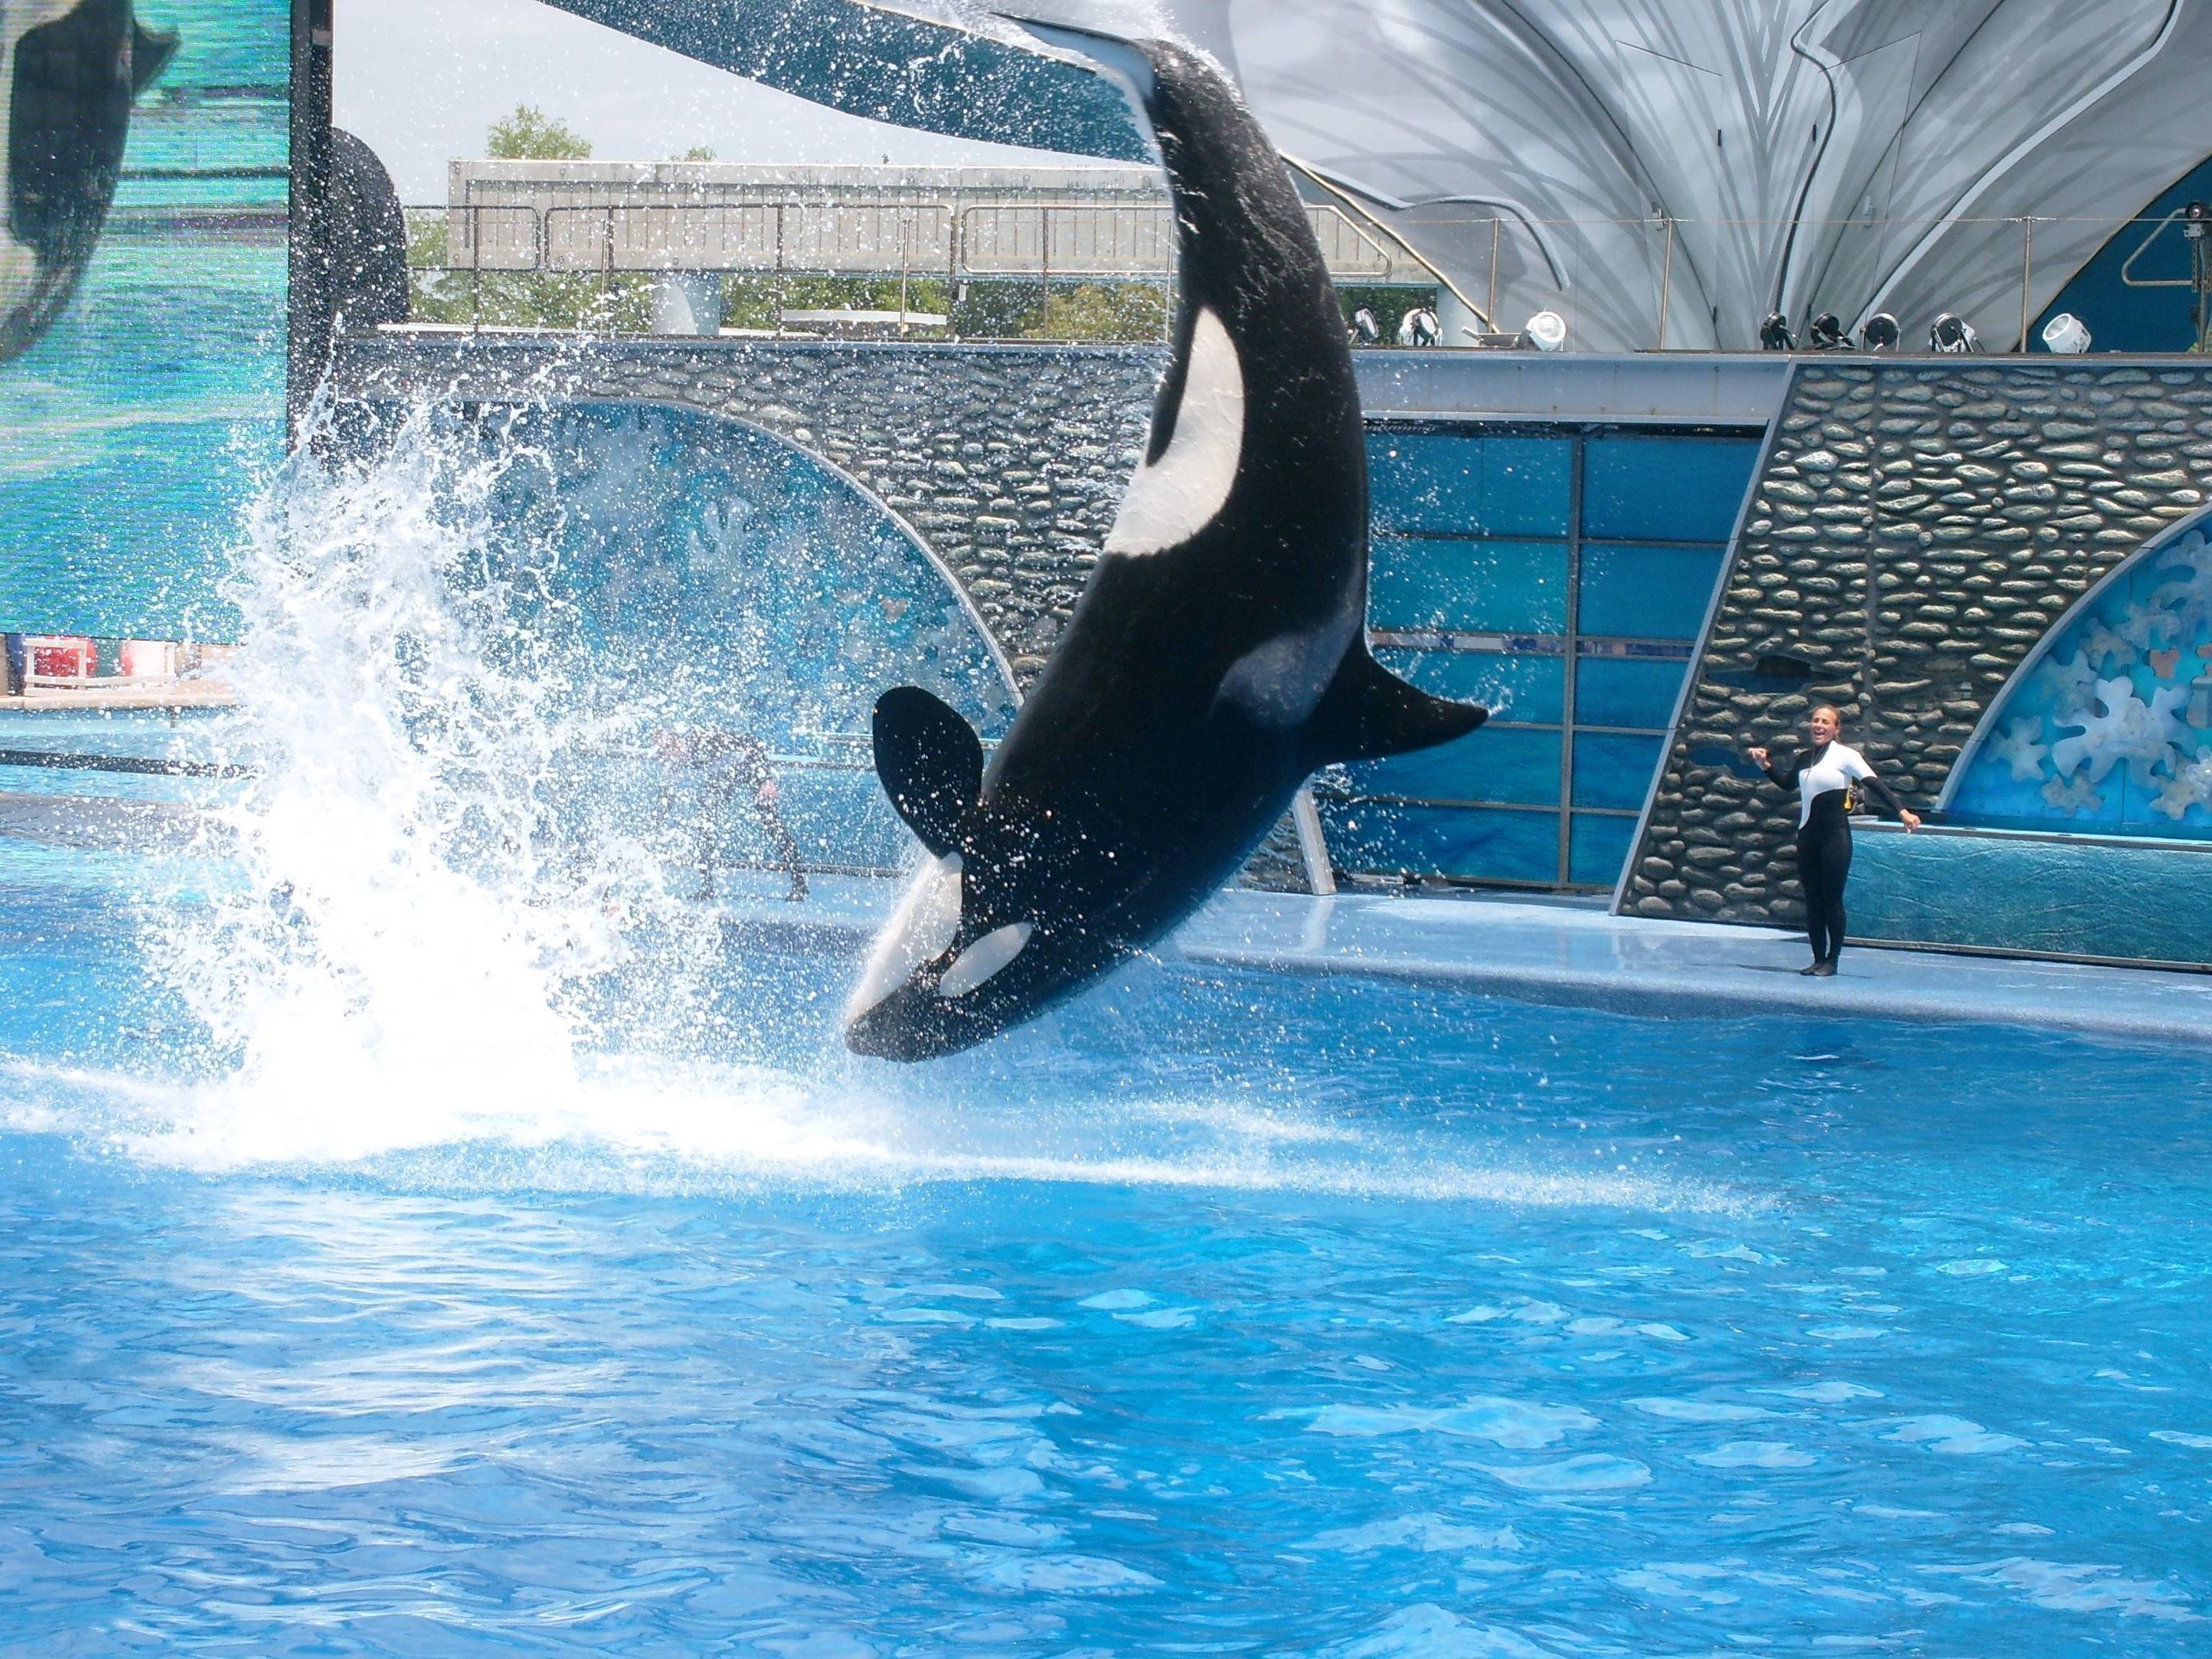 Res: 2765x2074, File:Shamu at SeaWorld.JPG - Wikimedia Commons